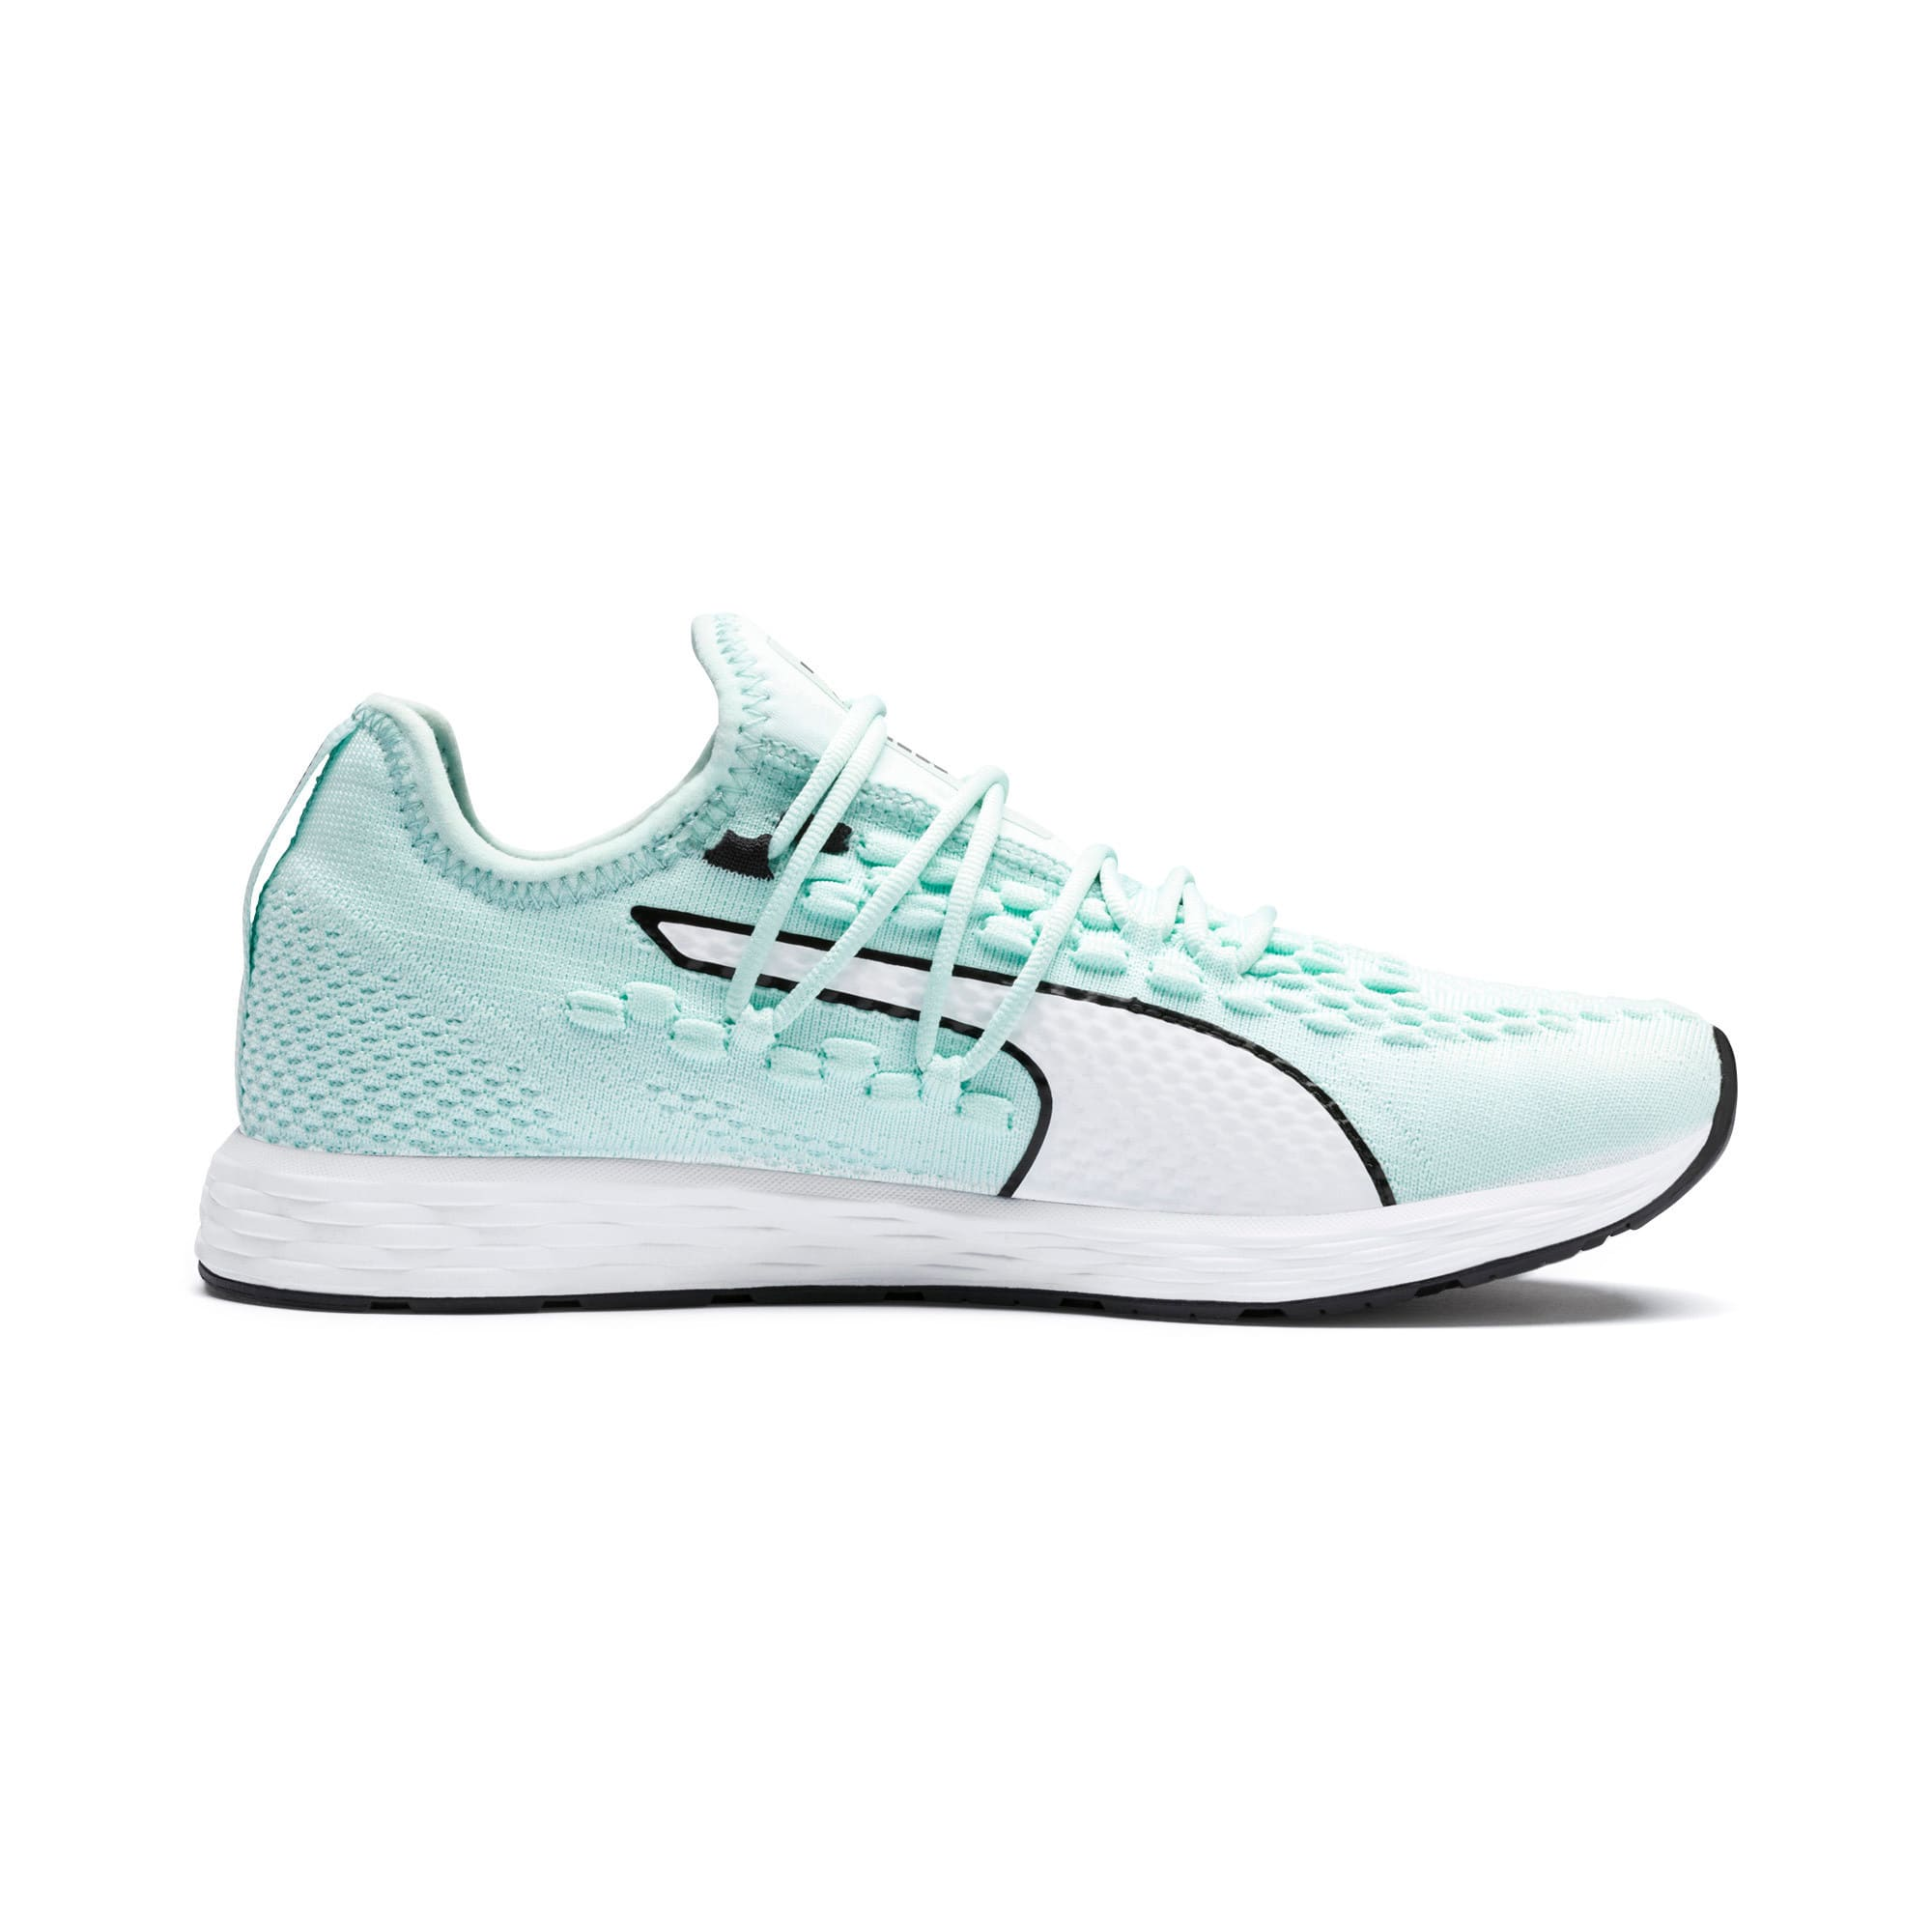 Thumbnail 5 of SPEED 300 RACER Women's Running Shoes, Fair Aqua-White-Black, medium